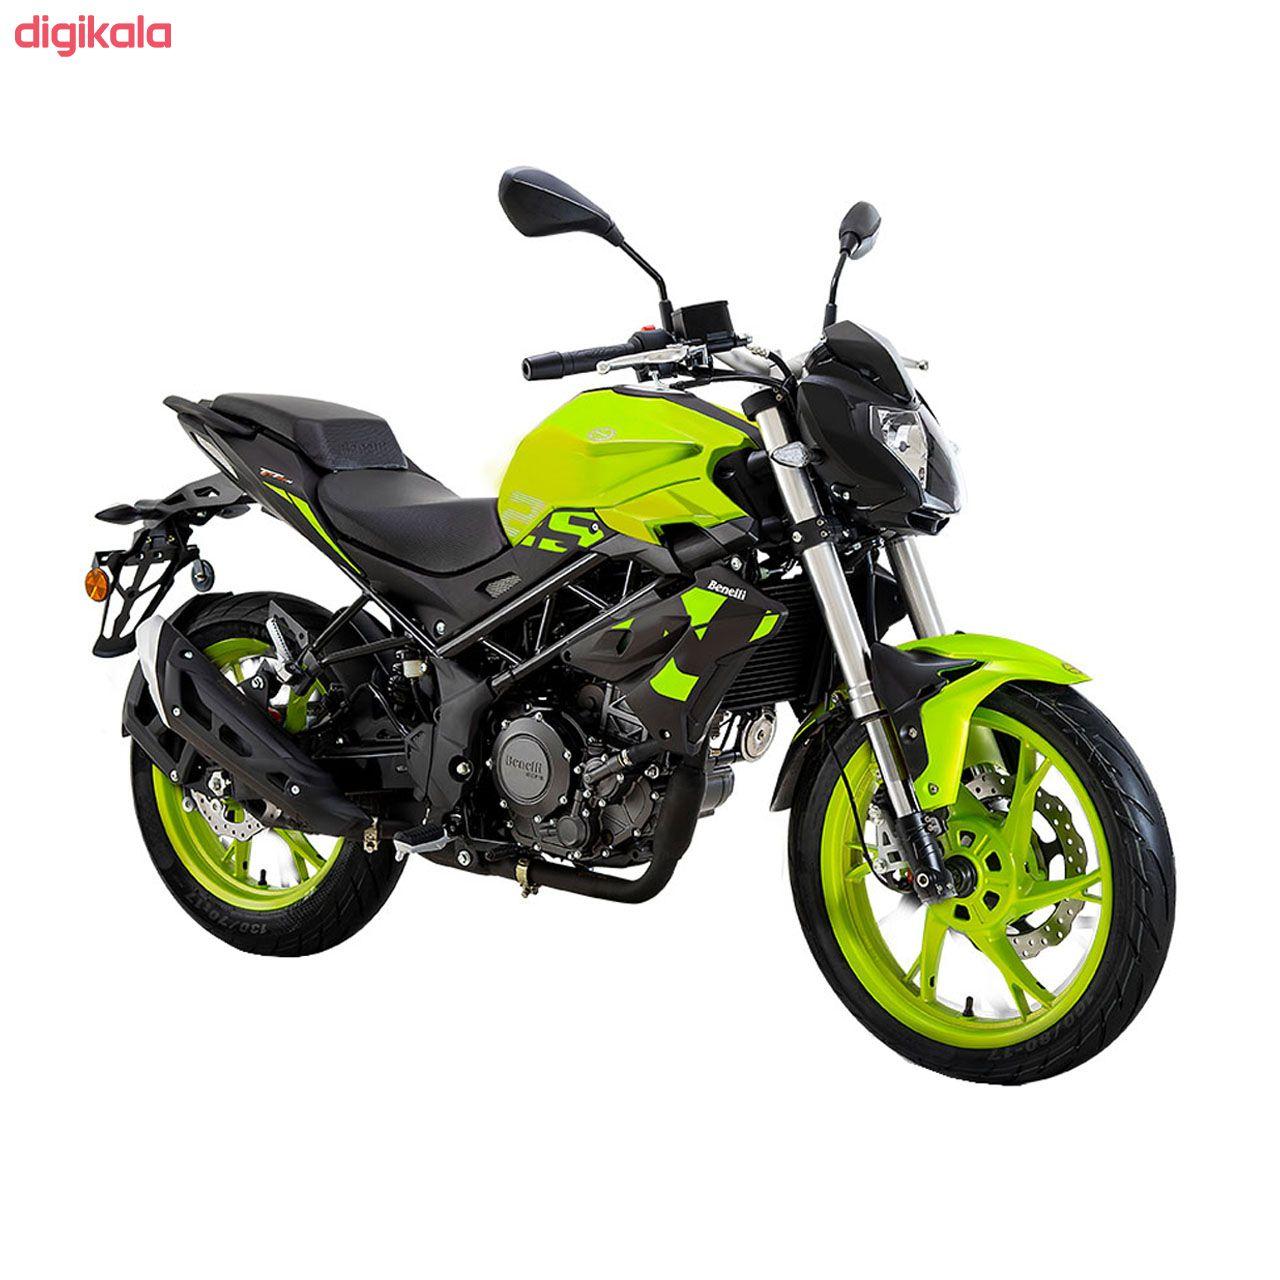 موتورسیکلت بنلی مدل TNT25N سال 1399 main 1 5